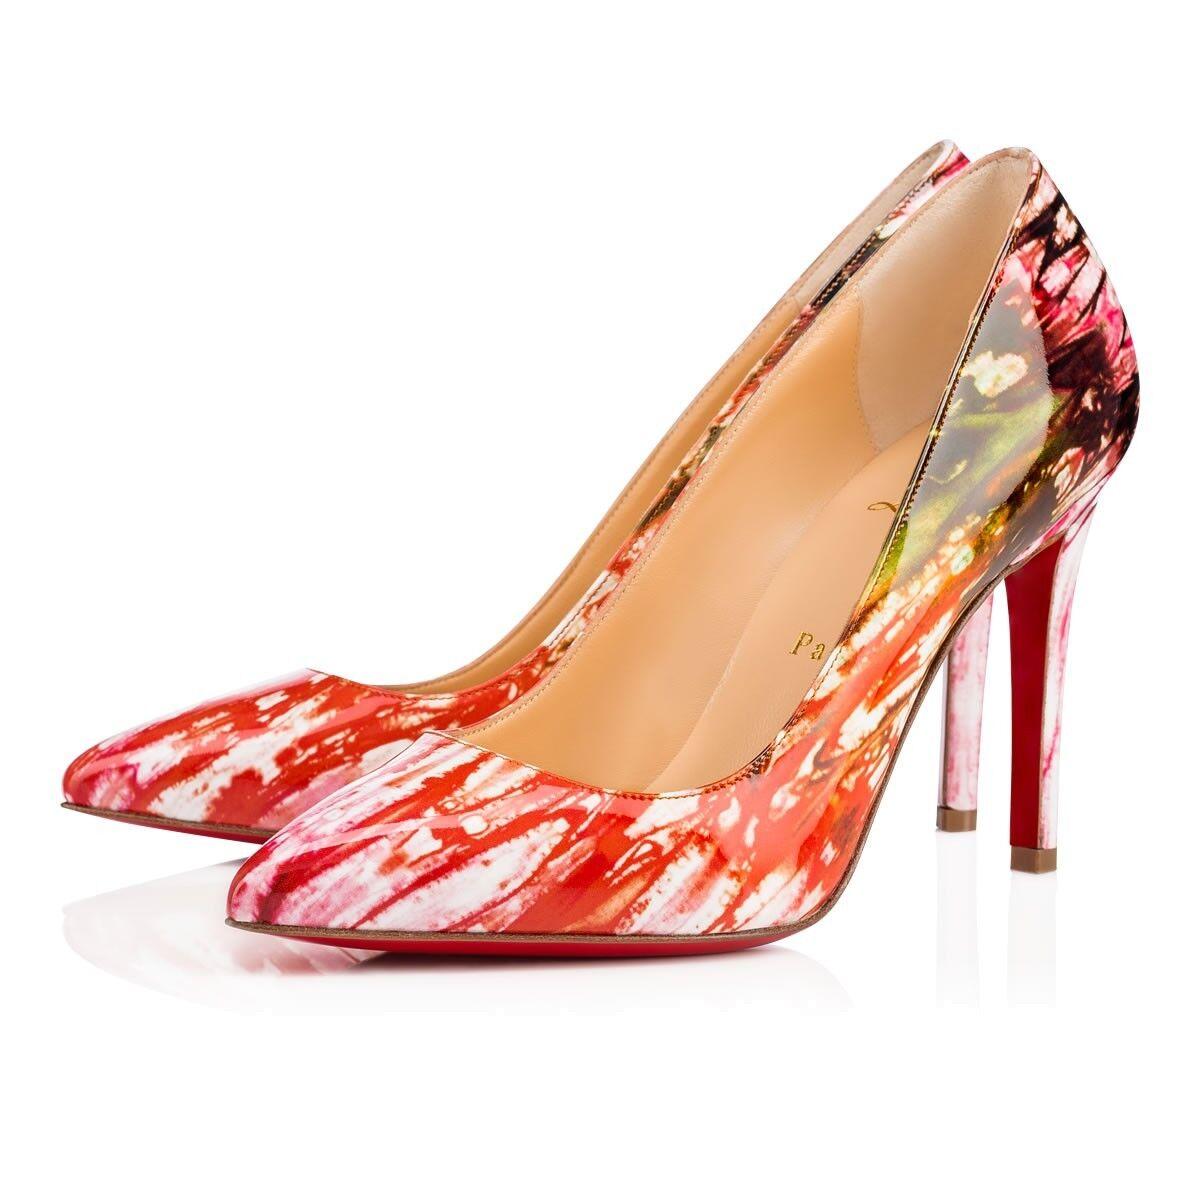 NIB Christian Louboutin Pigalle 100 Pink Bazin Pompadour Patent Heel Pump 38